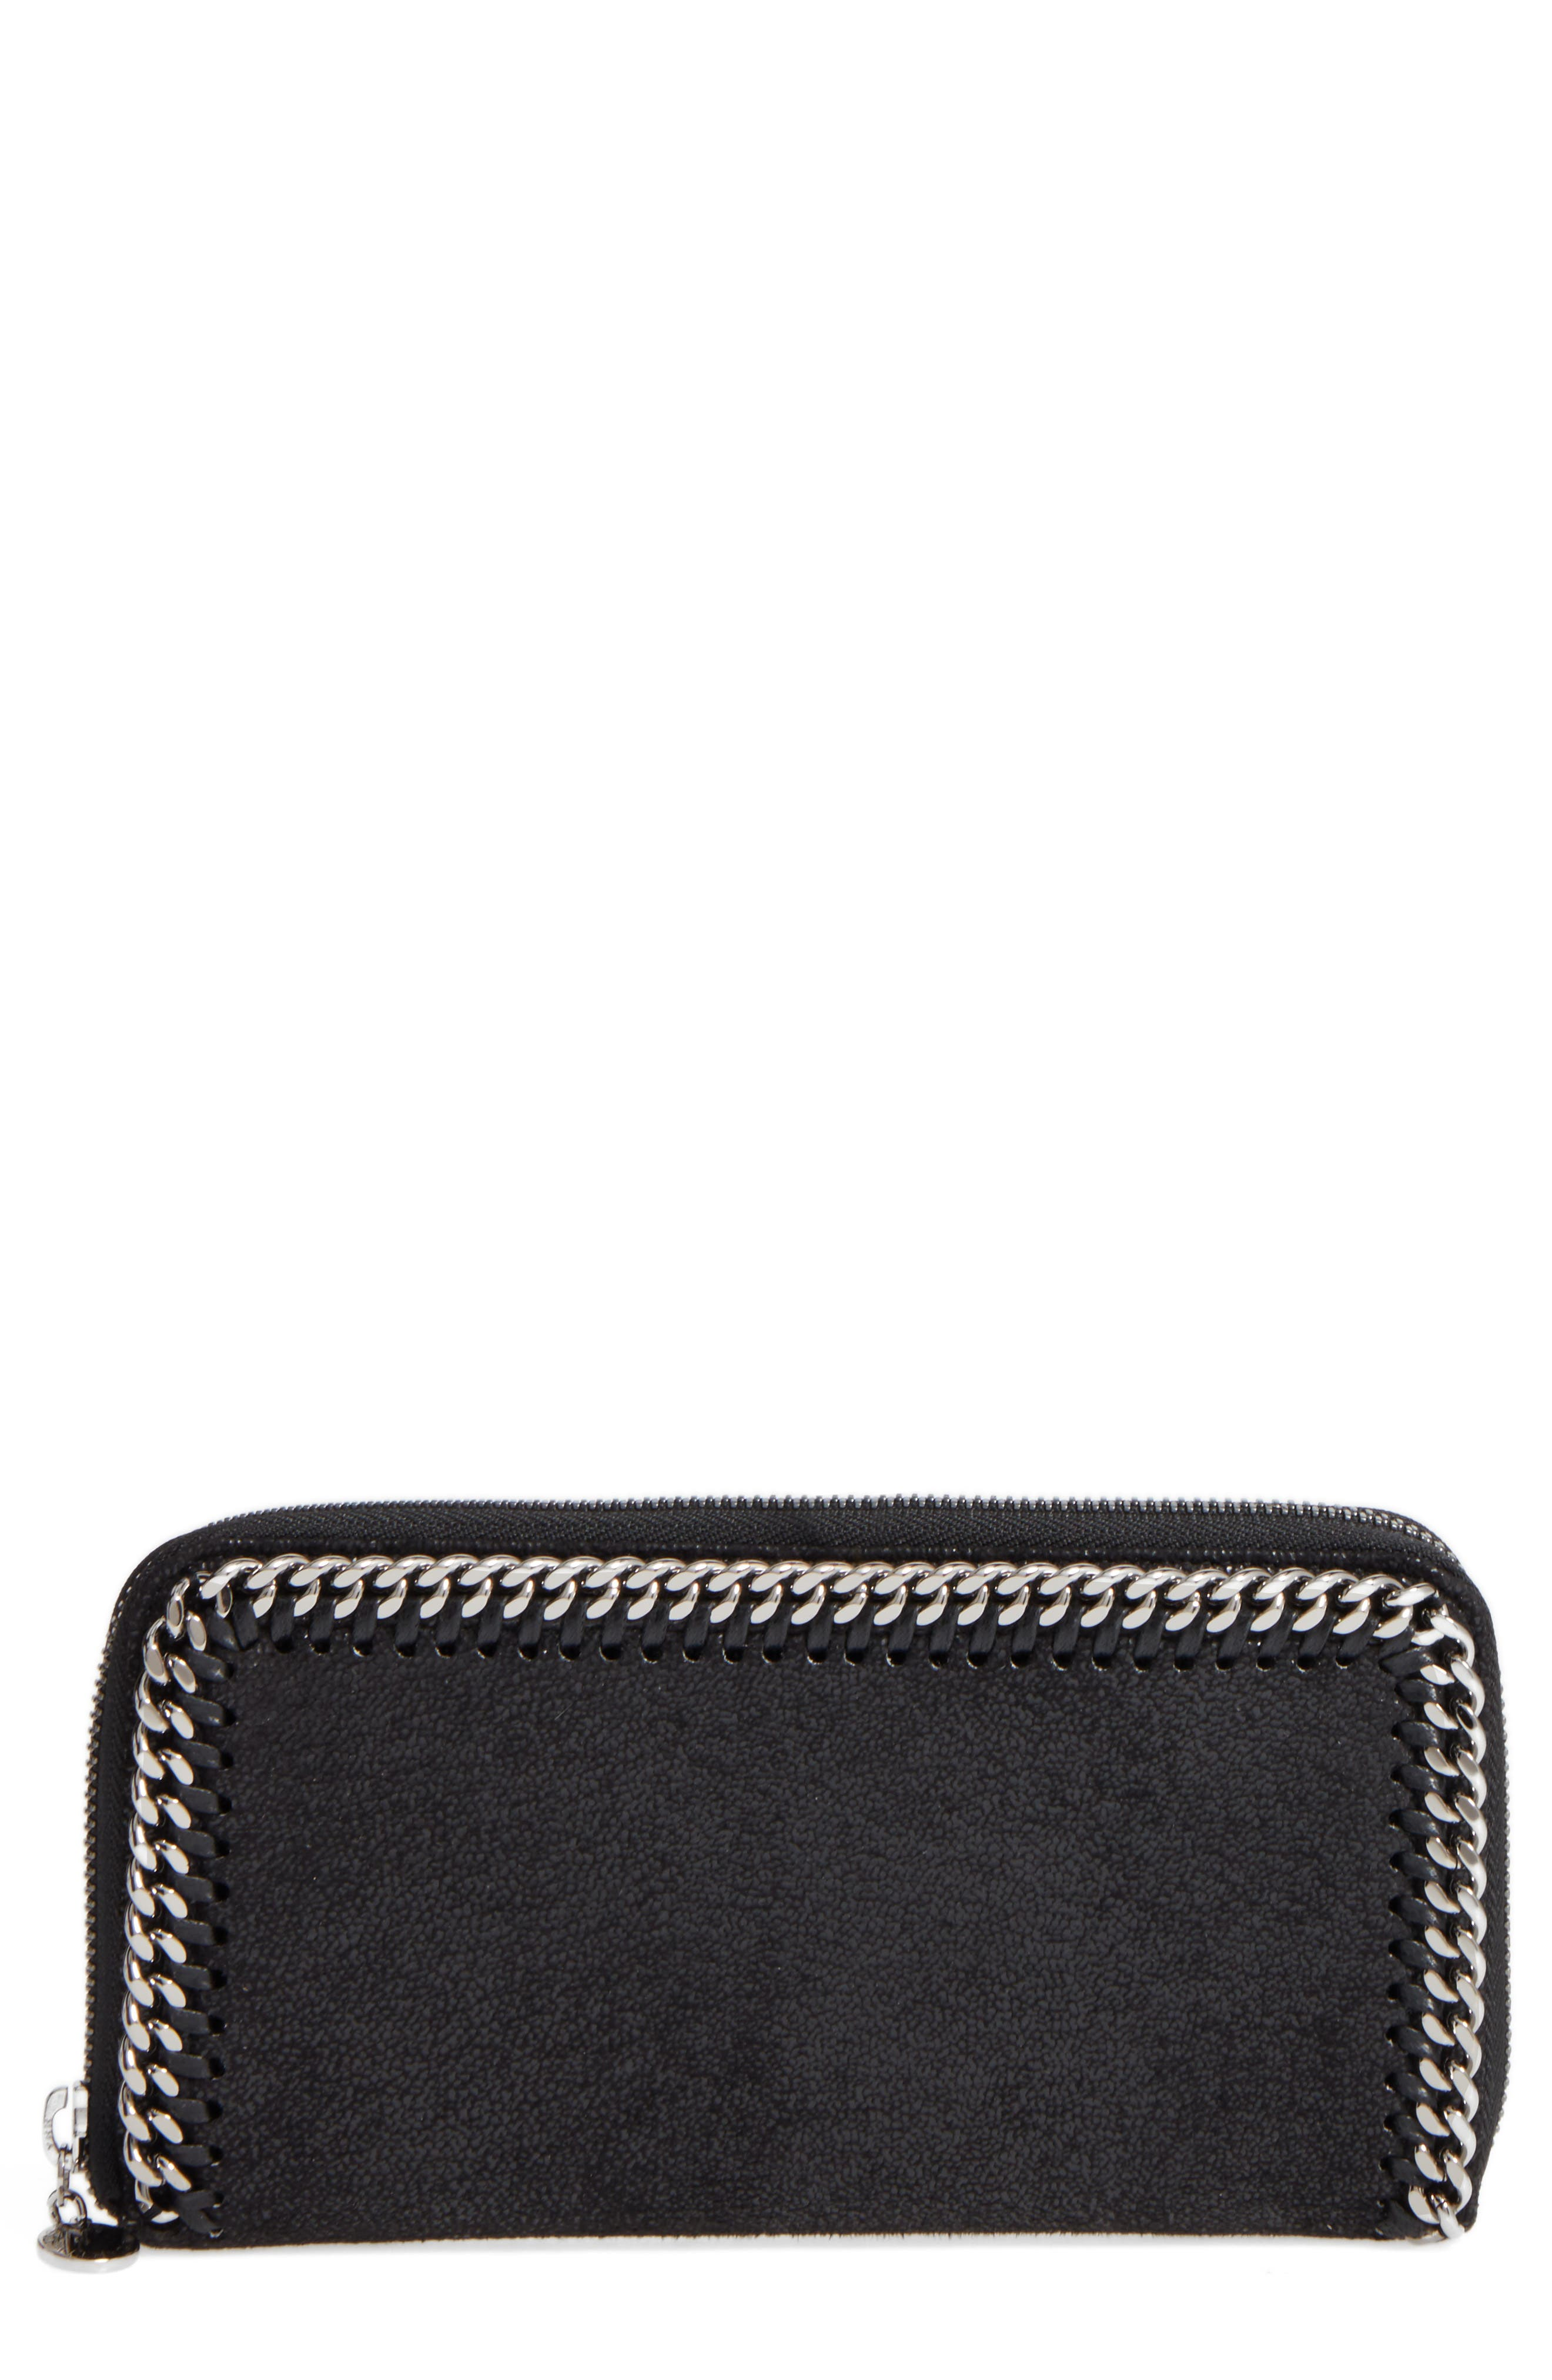 Falabella Faux Leather Wallet,                             Main thumbnail 1, color,                             001